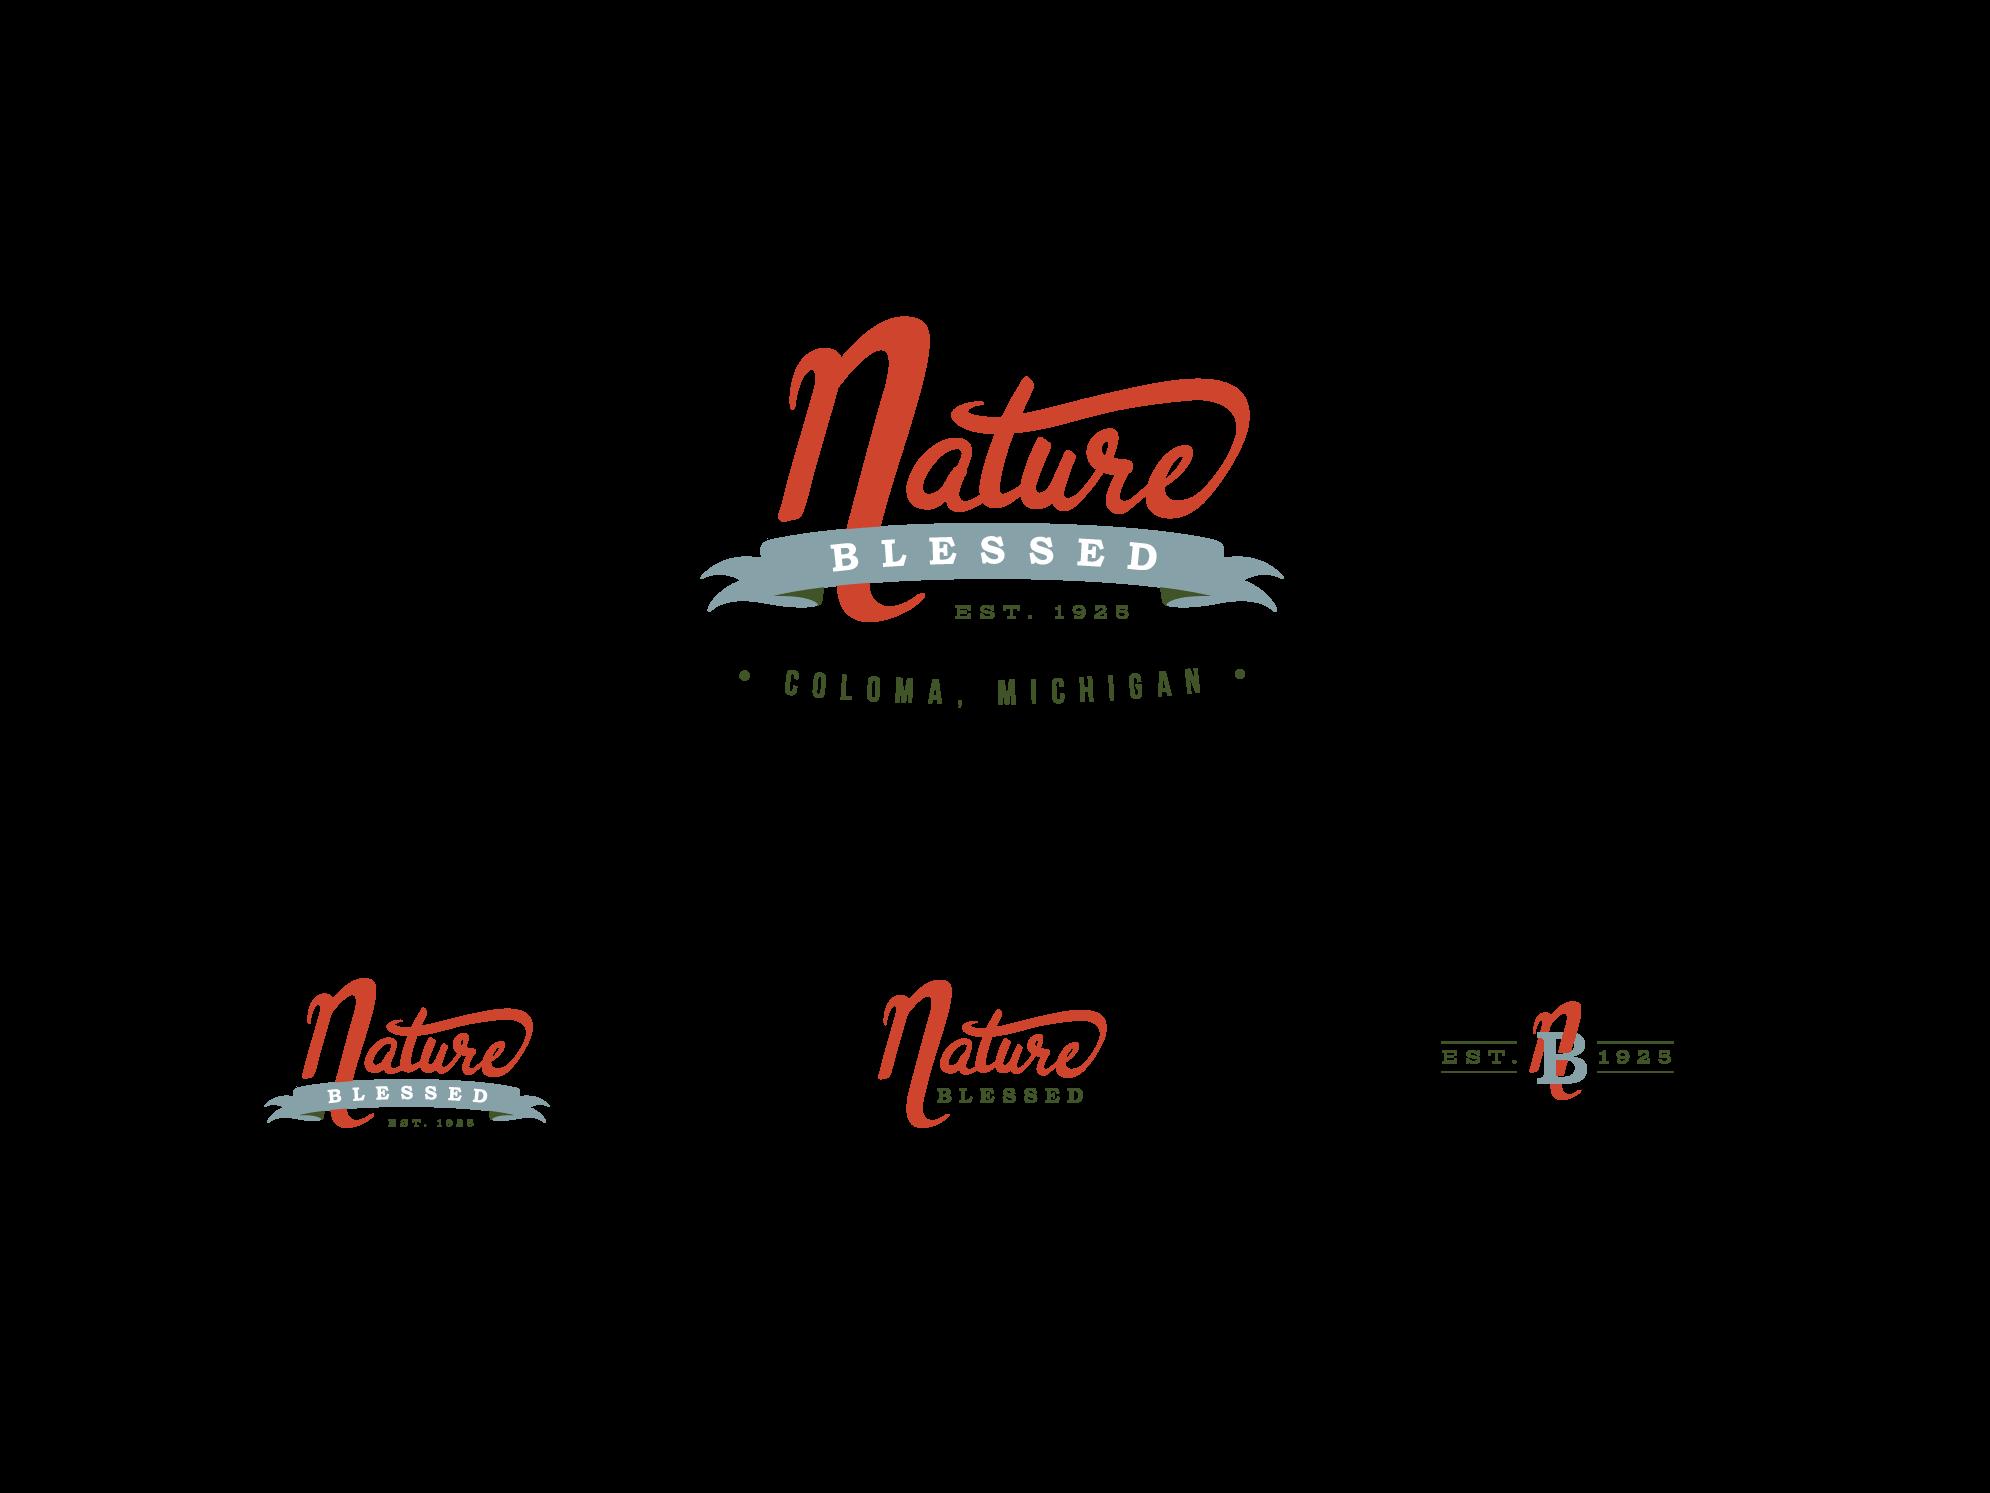 NatureBlessed_PrettyLethalDesigns_Portfolio_1 (1)